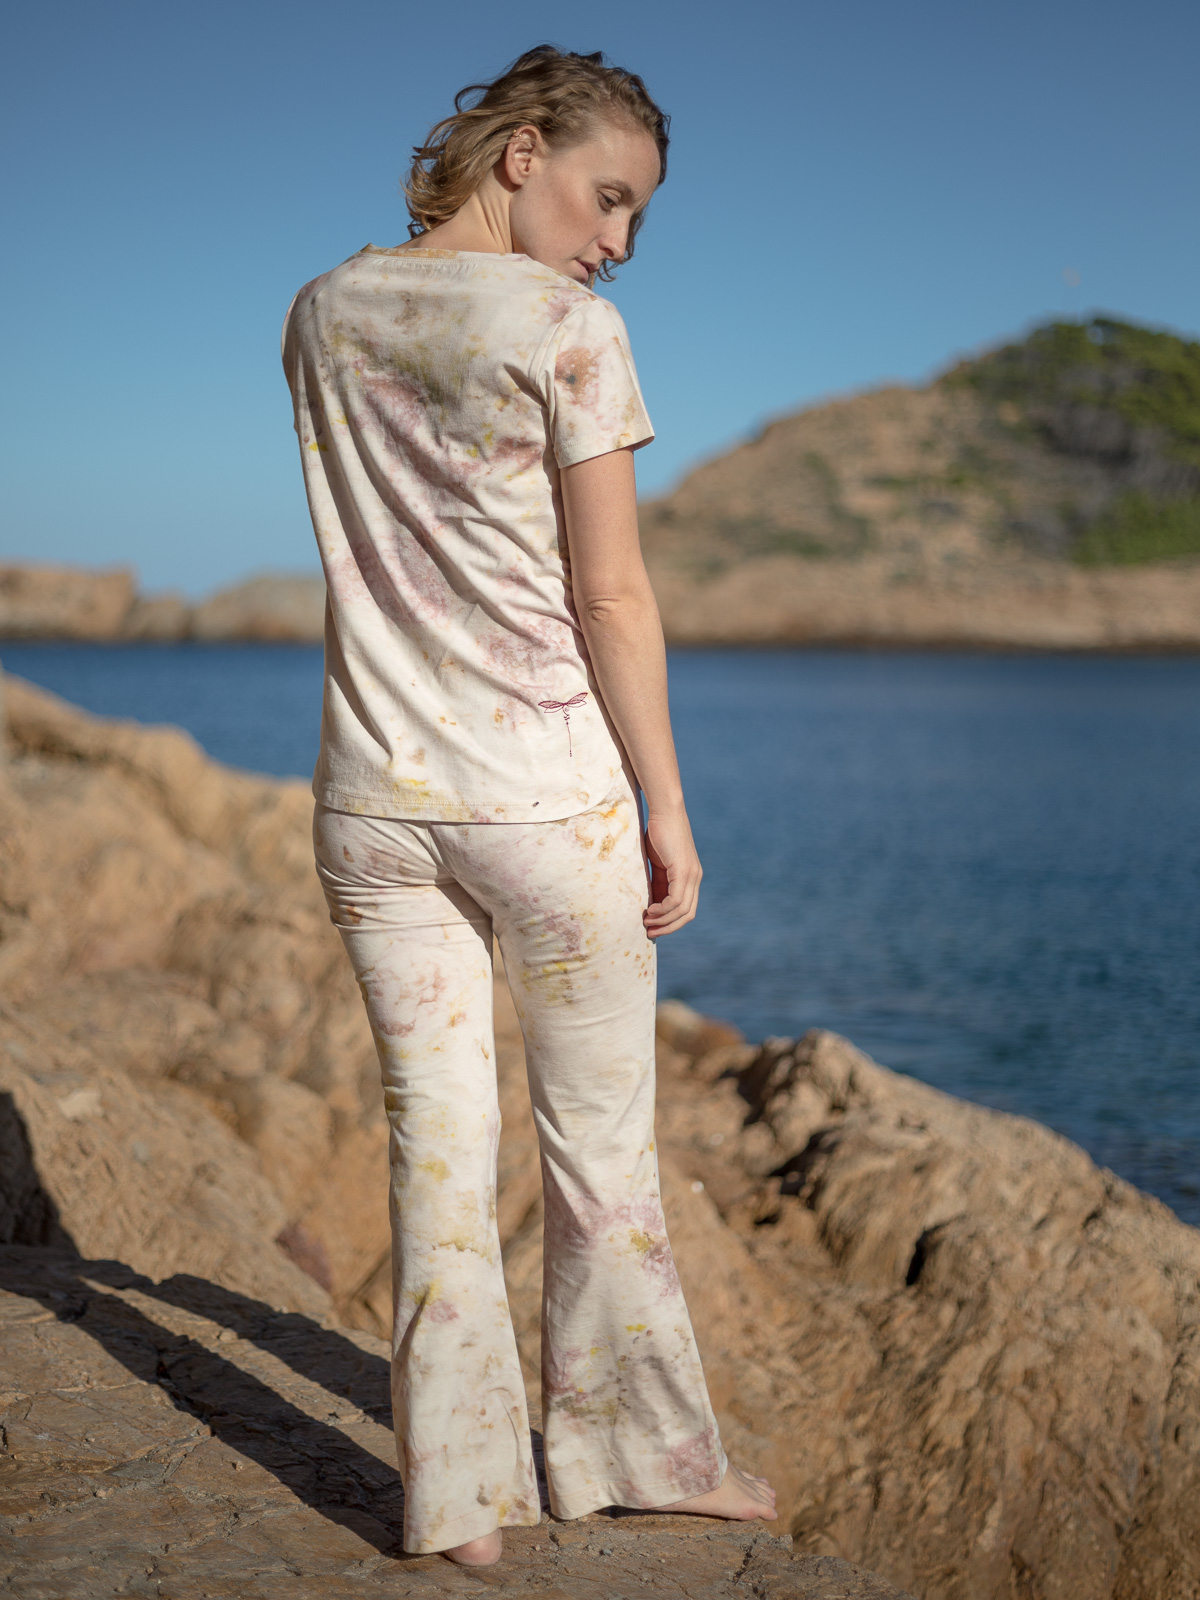 Pantalón Cotton on the Rocks Per mi